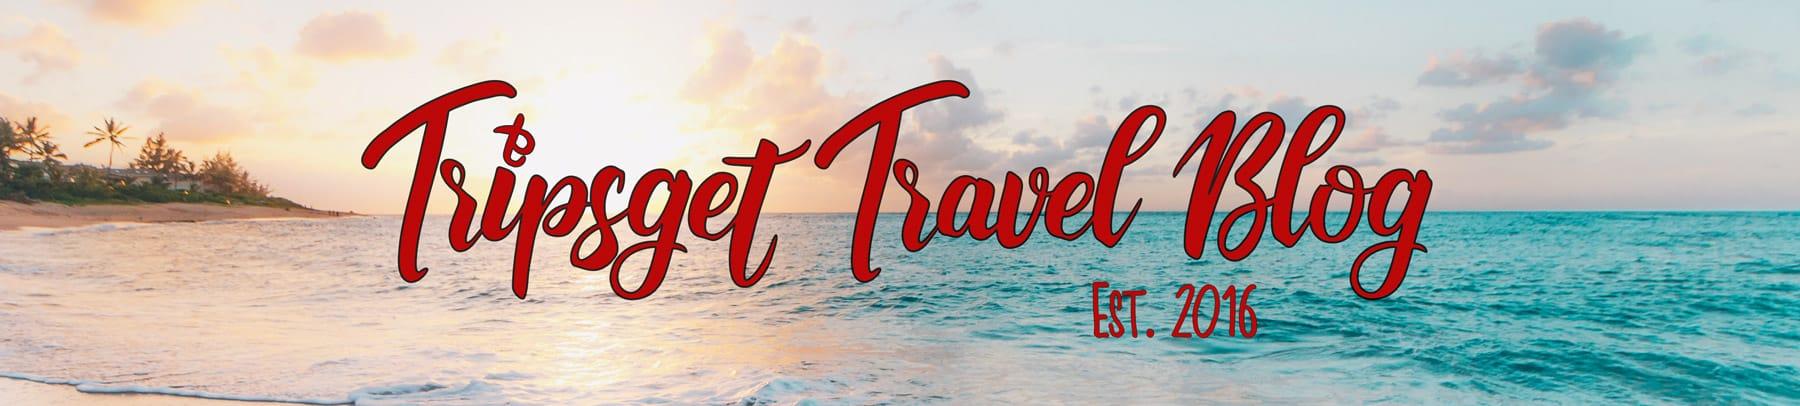 Tripsget Travel Blog